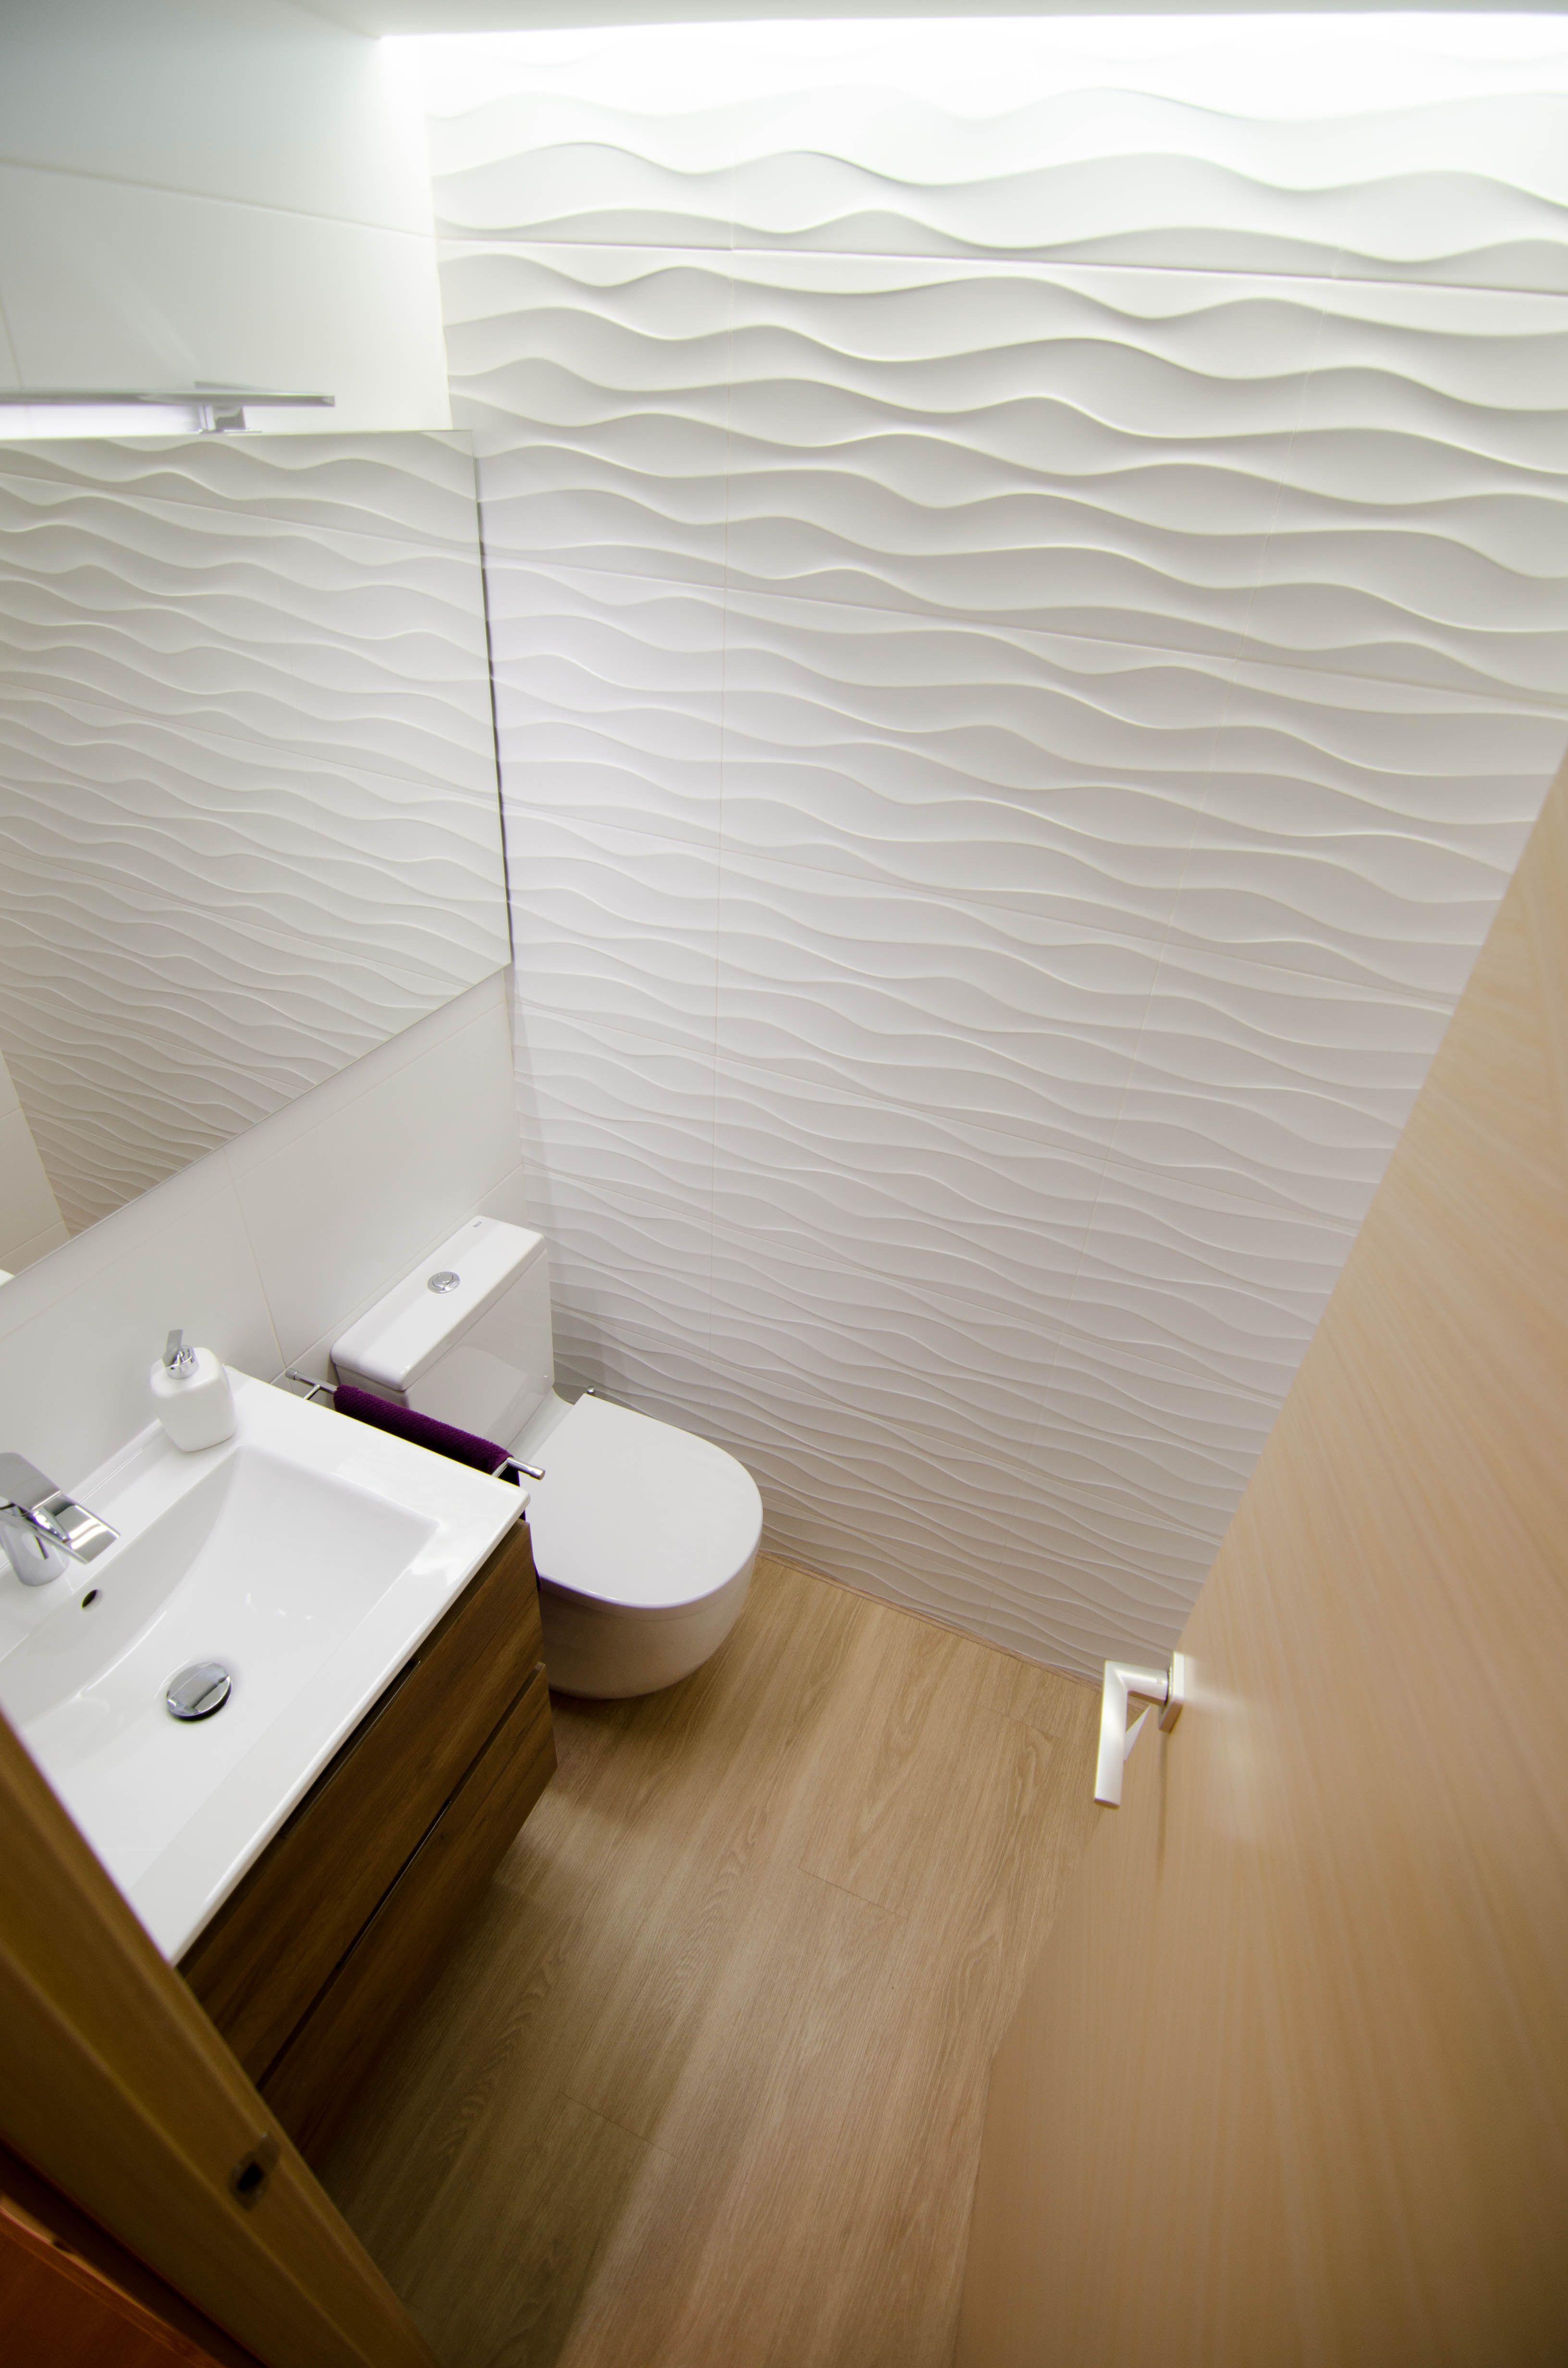 Pin by Joselyn Trigueros Aguilar on IDEAS | Pinterest | Bath ideas ...